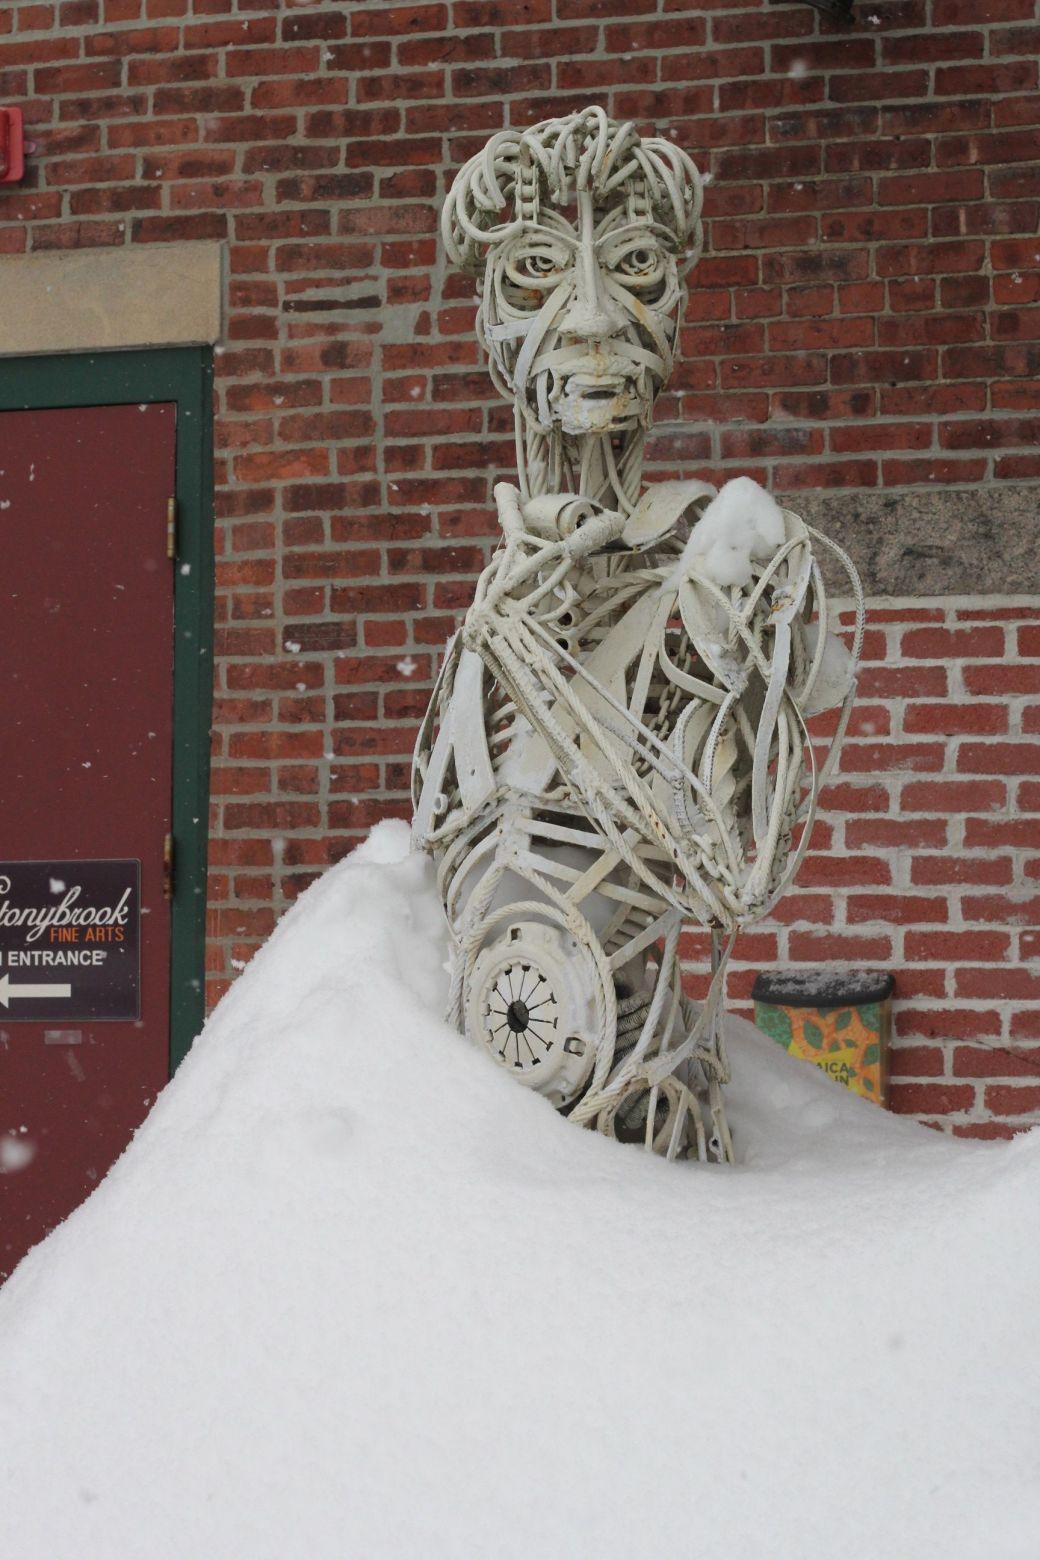 boston jamaica plain winter february 17 2015 david wires